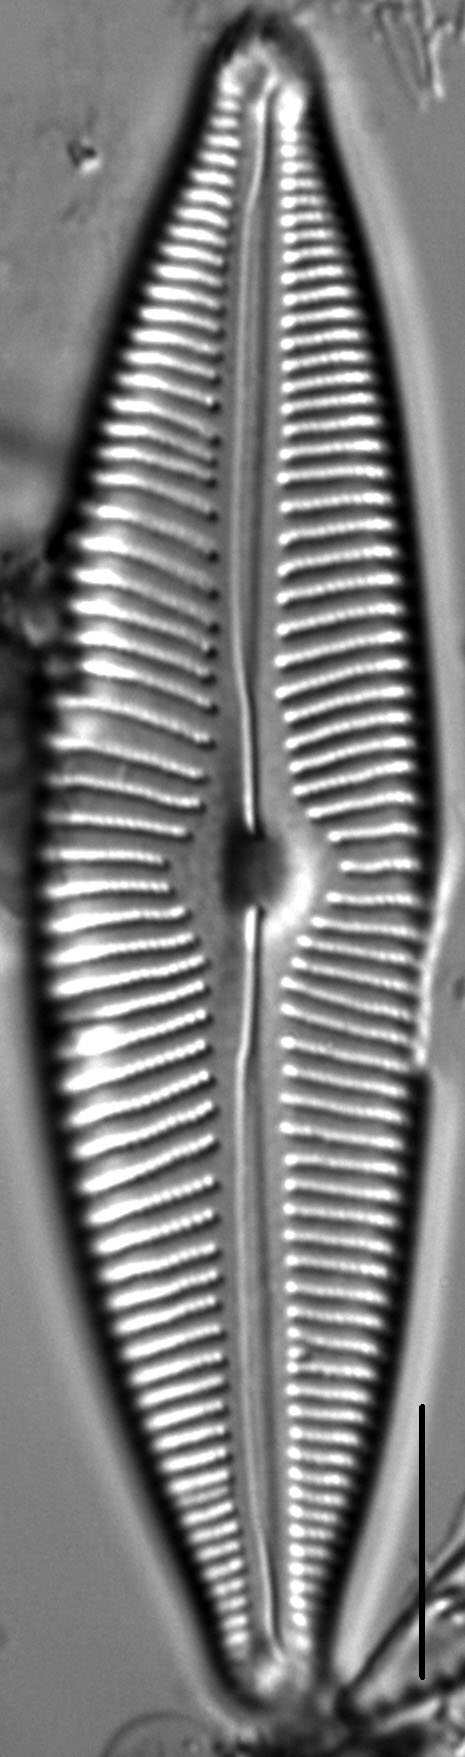 Cymbopleura rainierensis LM2